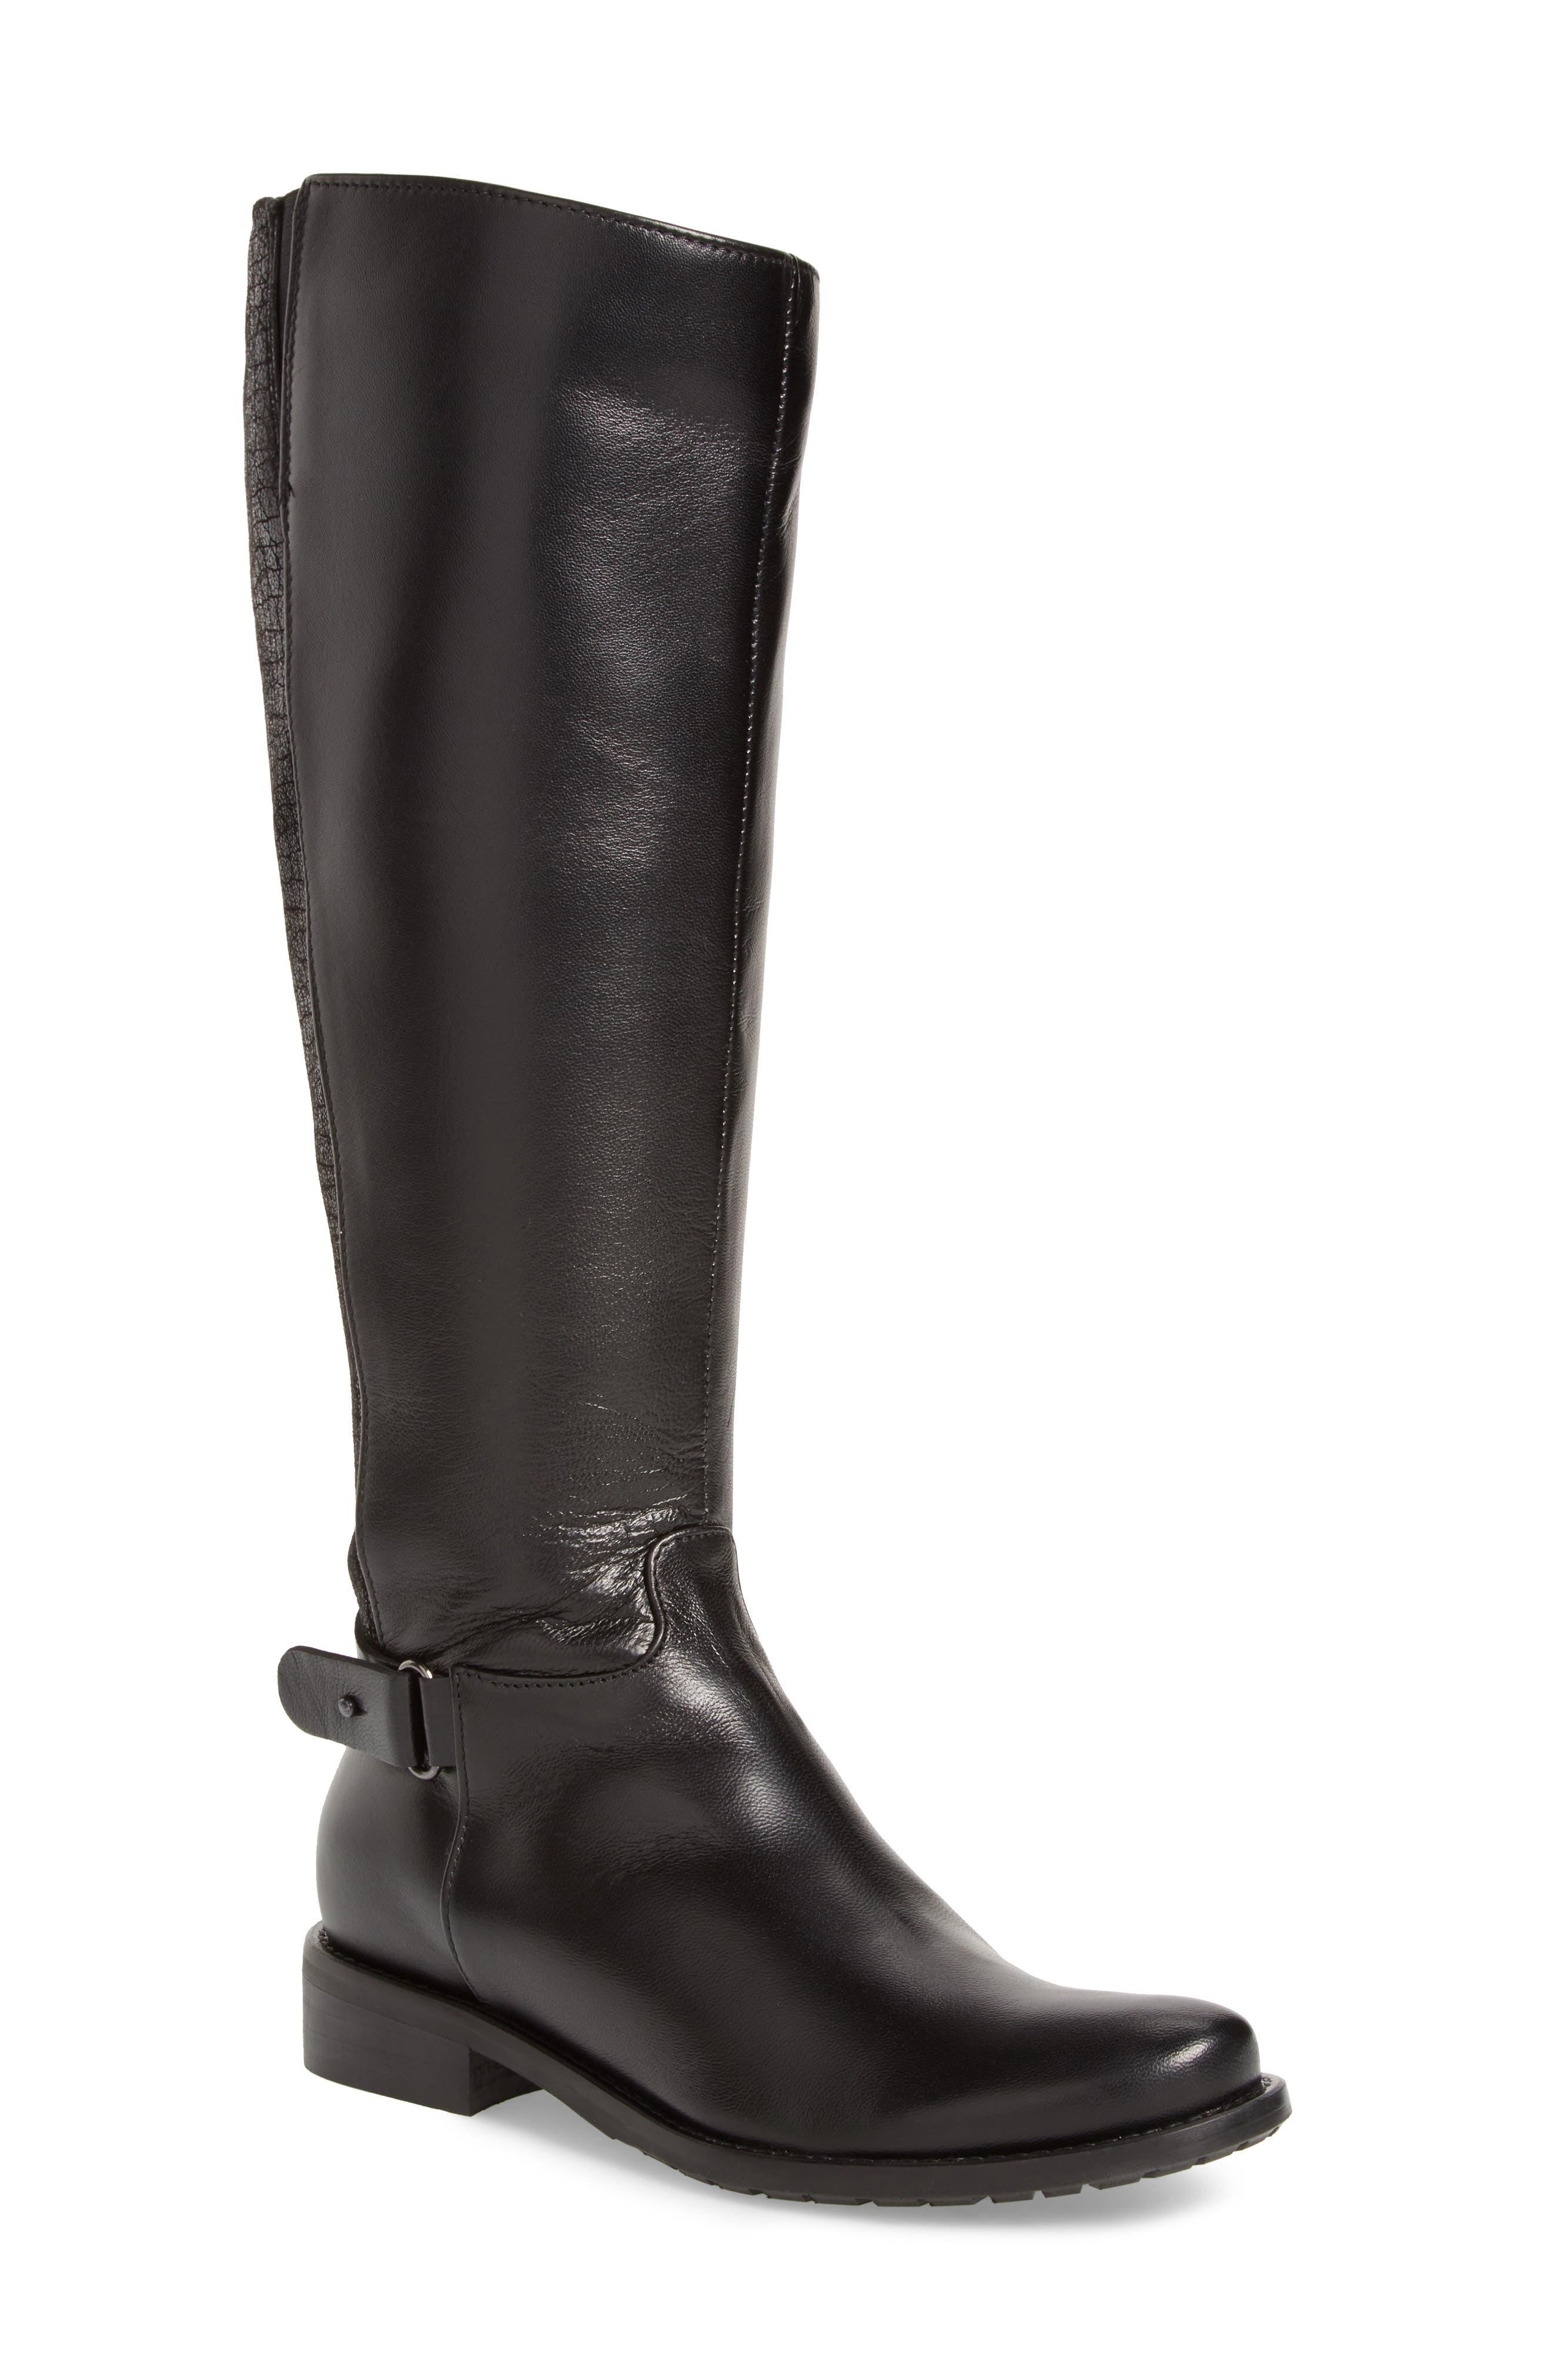 Alternate Image 1 Selected - Sesto Meucci Samson Boot (Women)